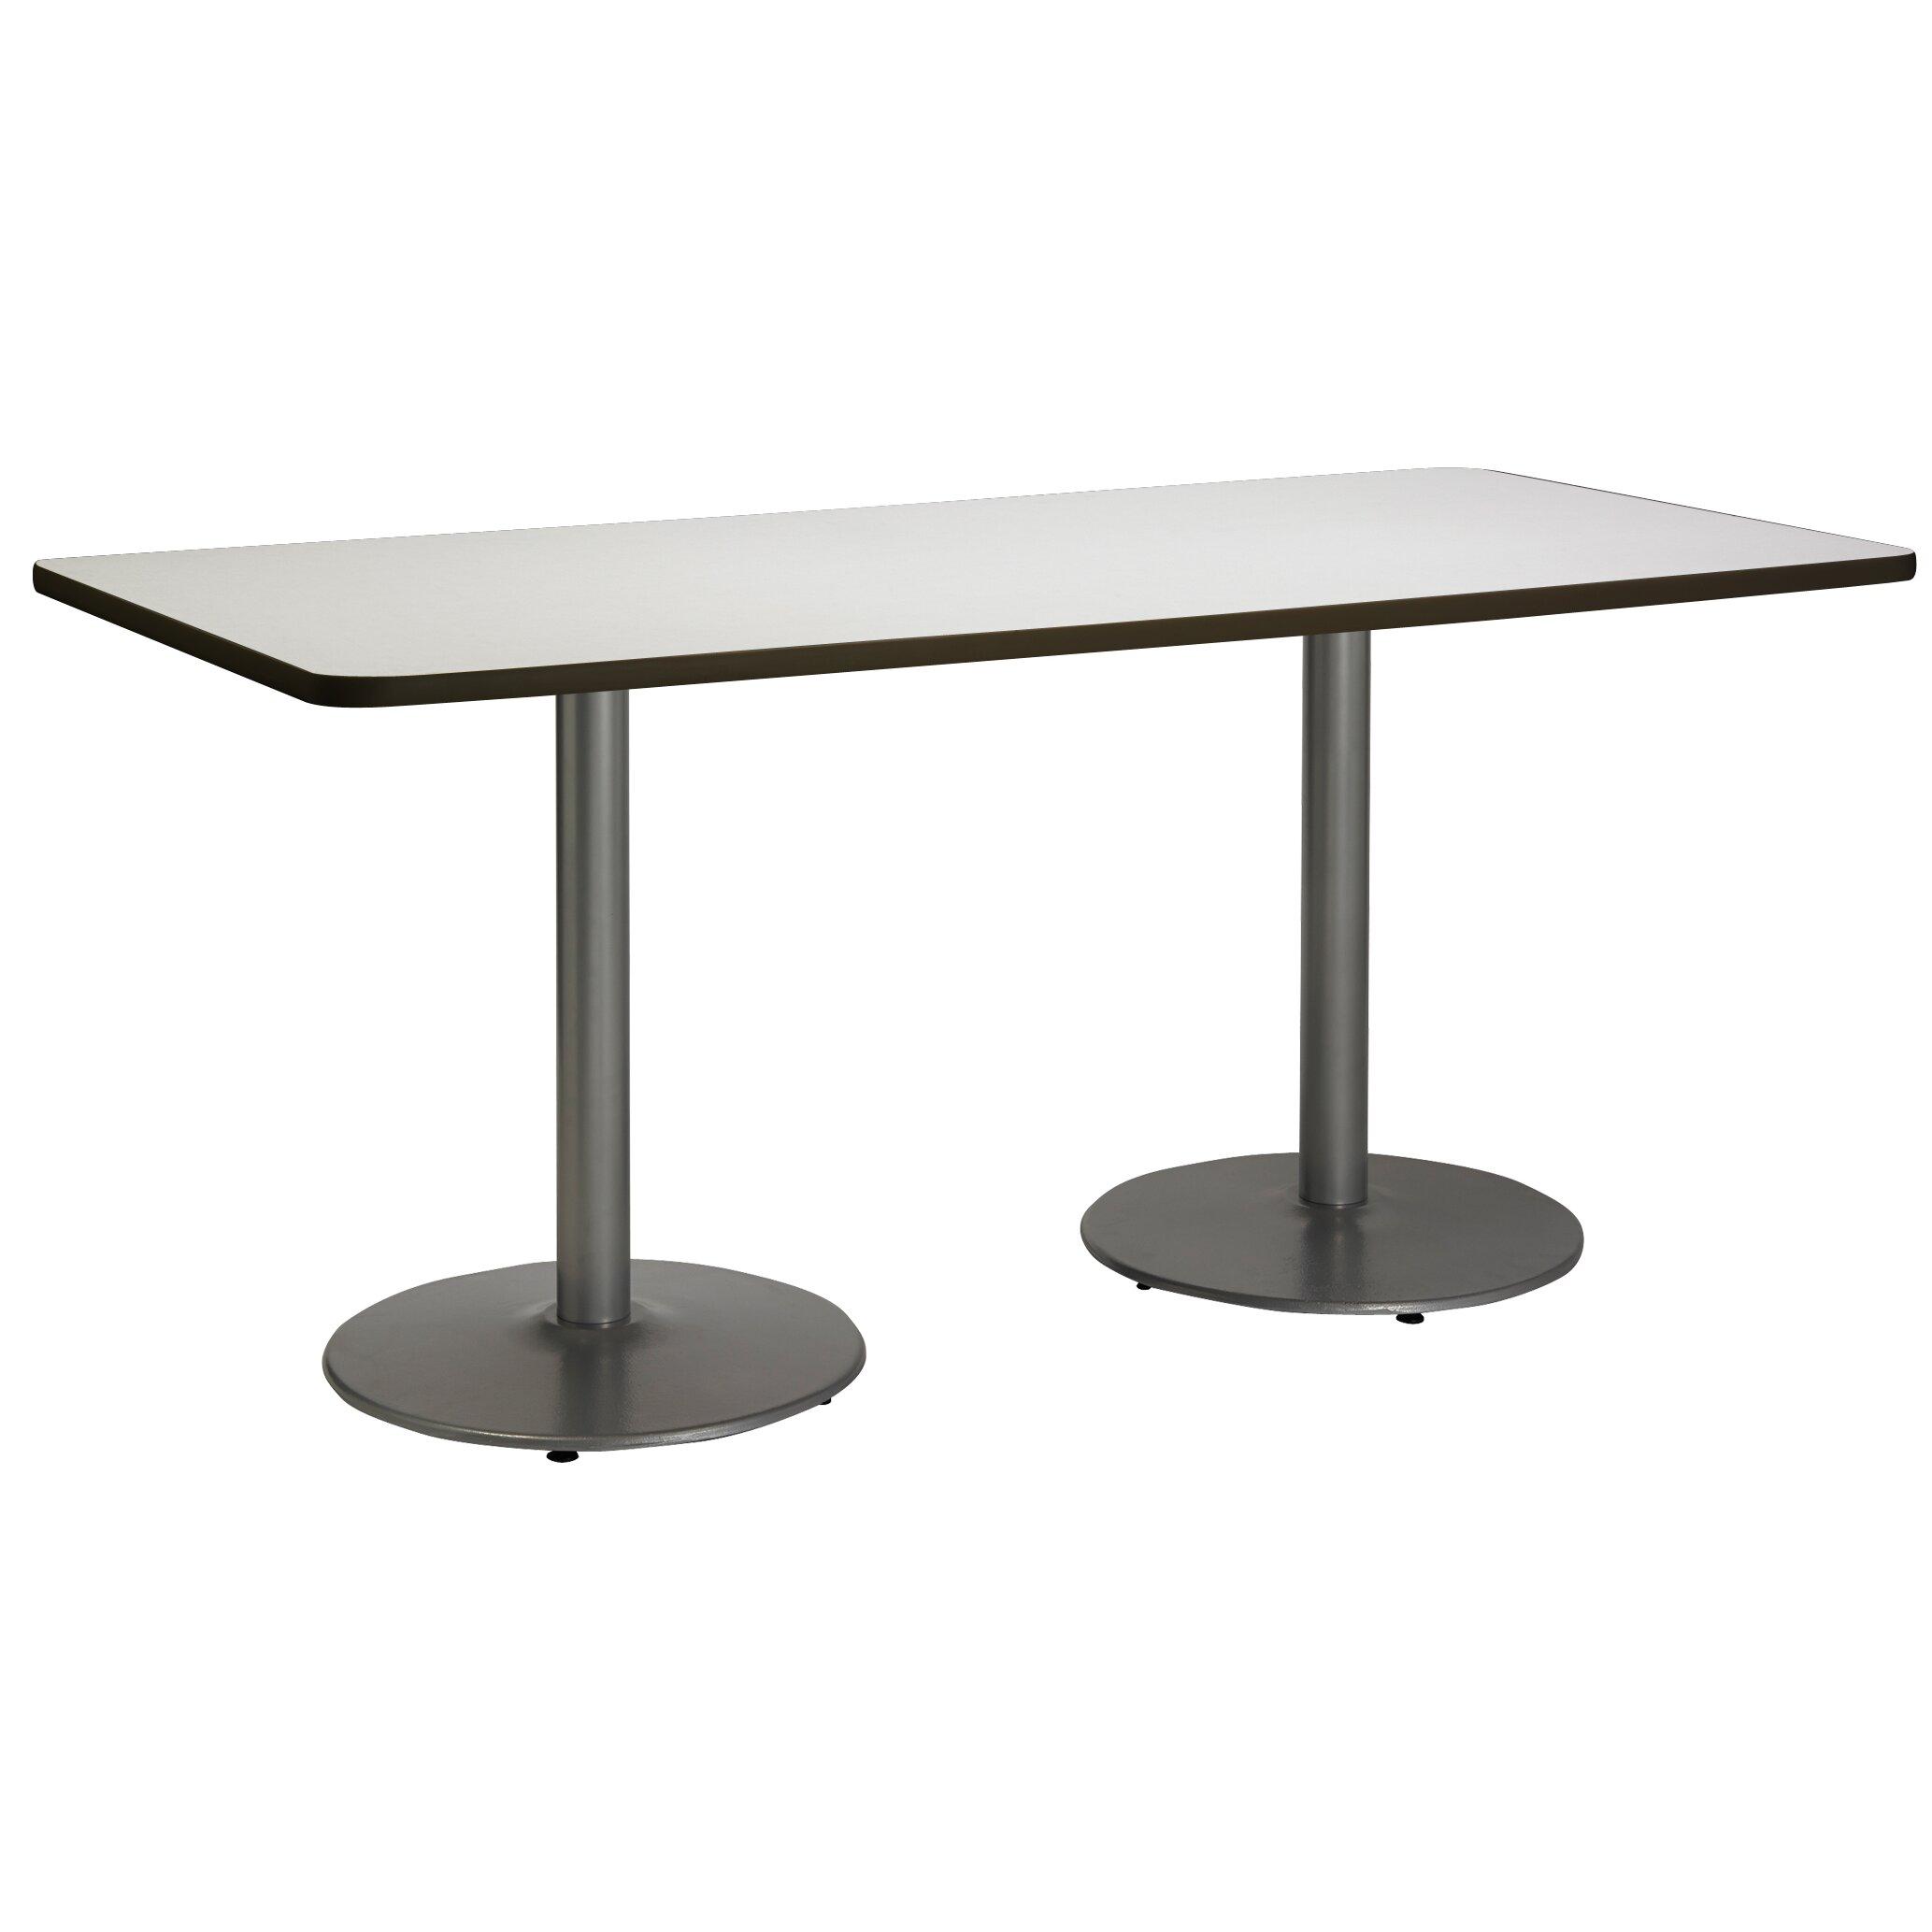 Kfi Seating 72 Quot X 30 Quot Round Base Pedestal Table Wayfair